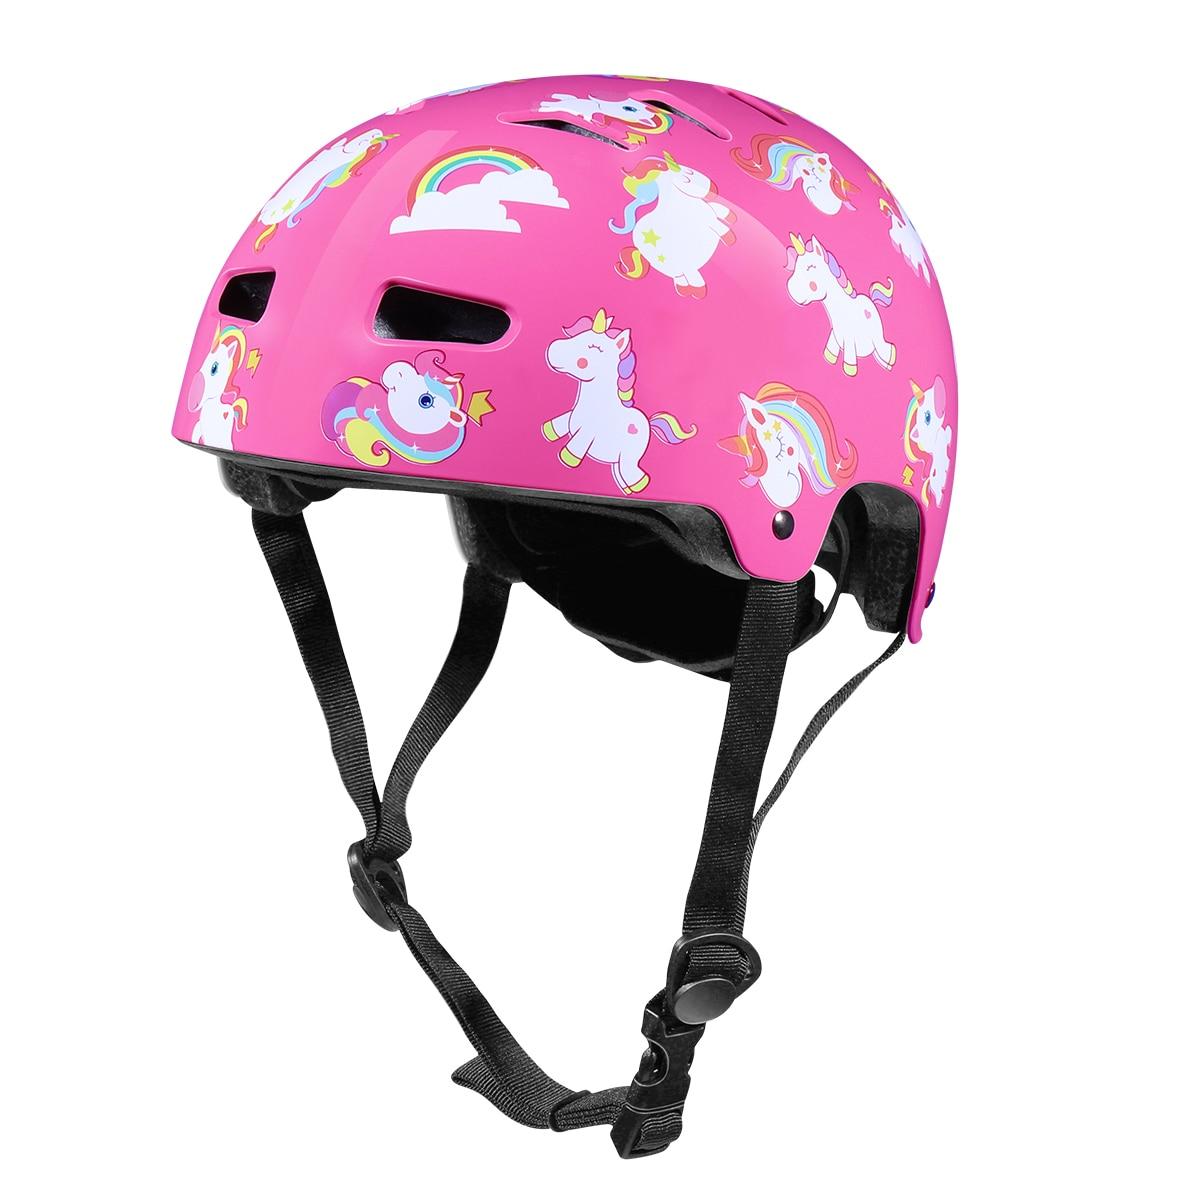 Protector de casco de bicicleta infantil con Protección deportiva pomo de palanca de cambios para ciclismo Scooter de patinaje accesorios de bicicleta